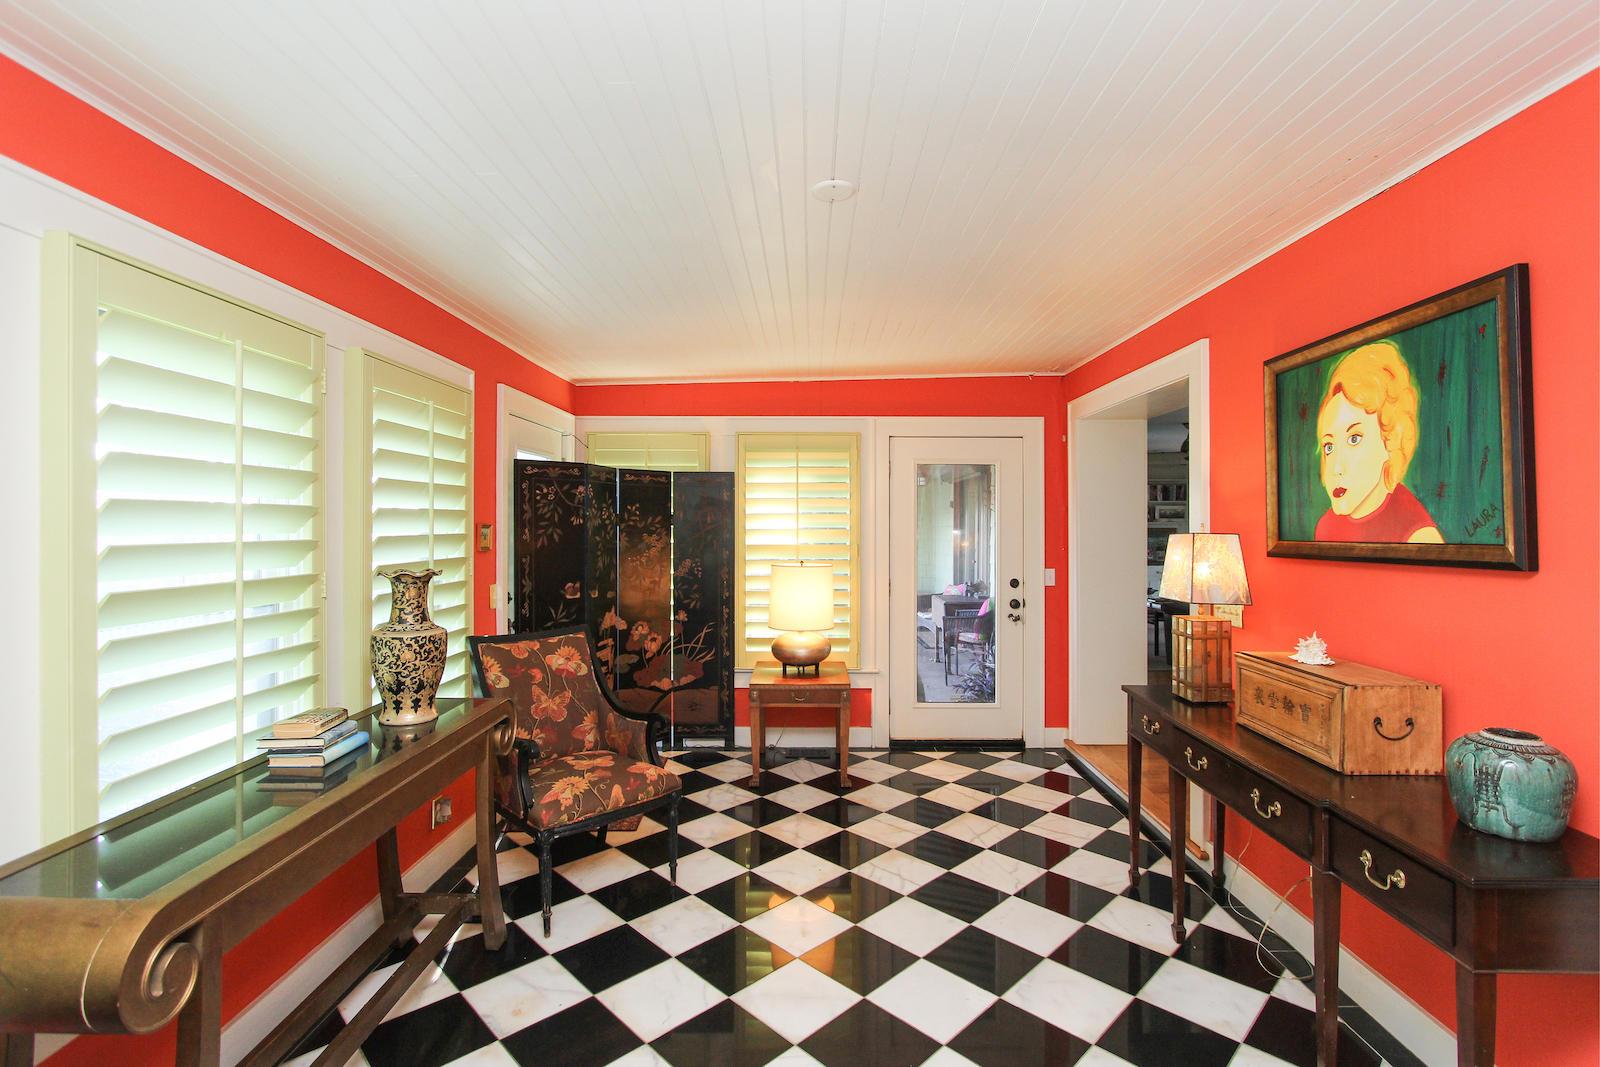 Albemarle Point Homes For Sale - 3 Albemarle, Charleston, SC - 26